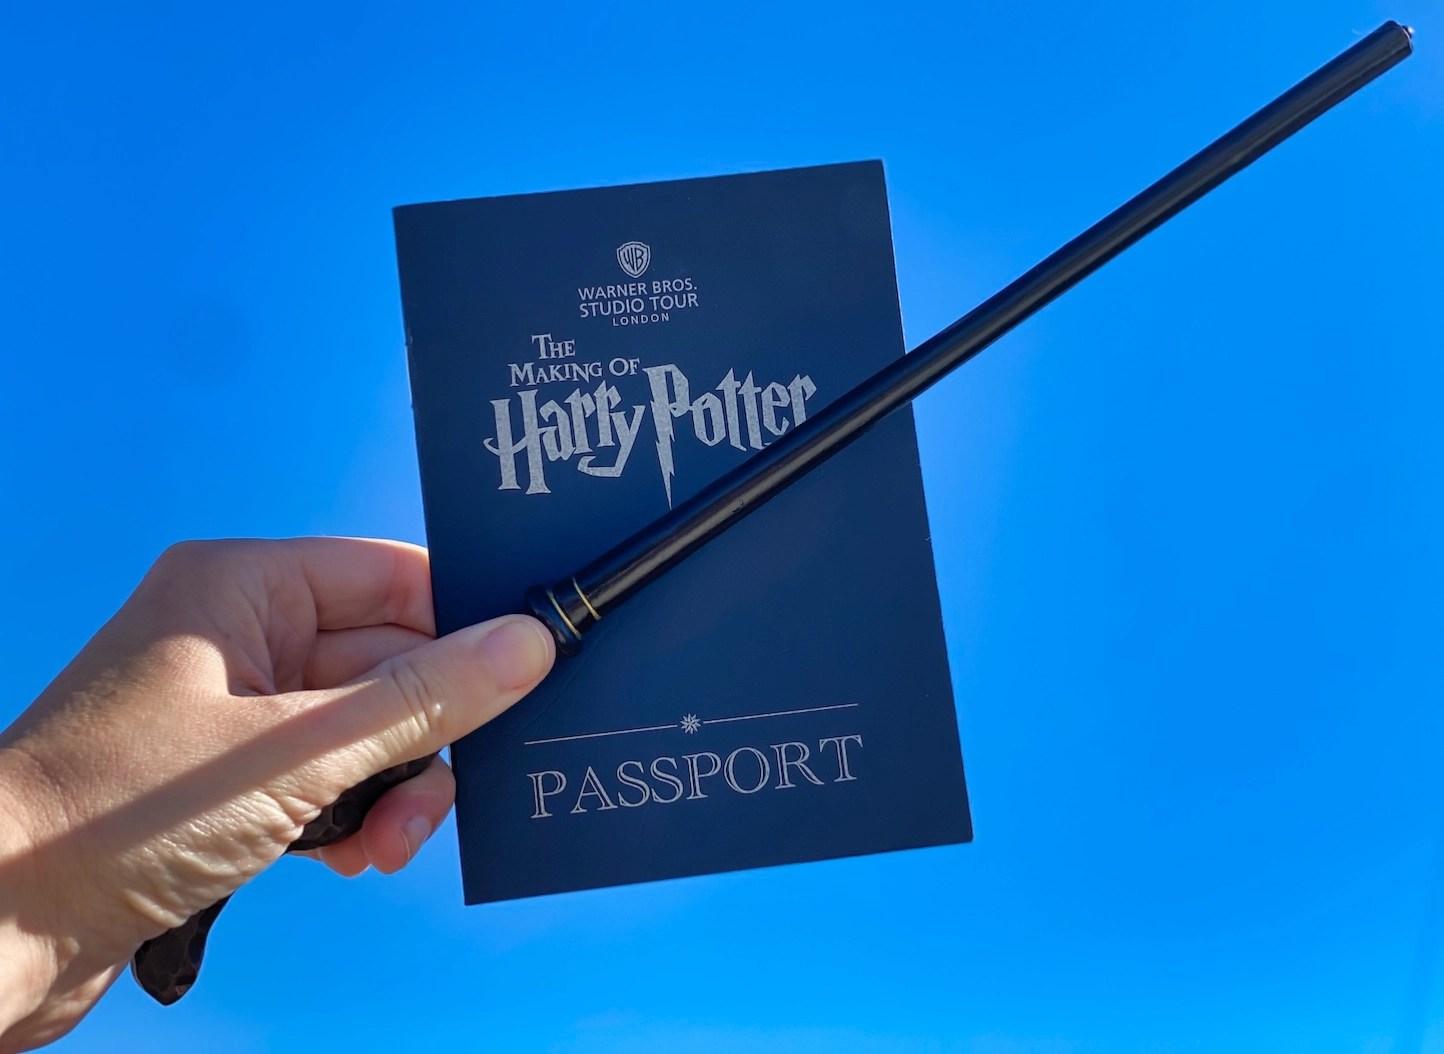 Harry Potter Studio Tour - Passport